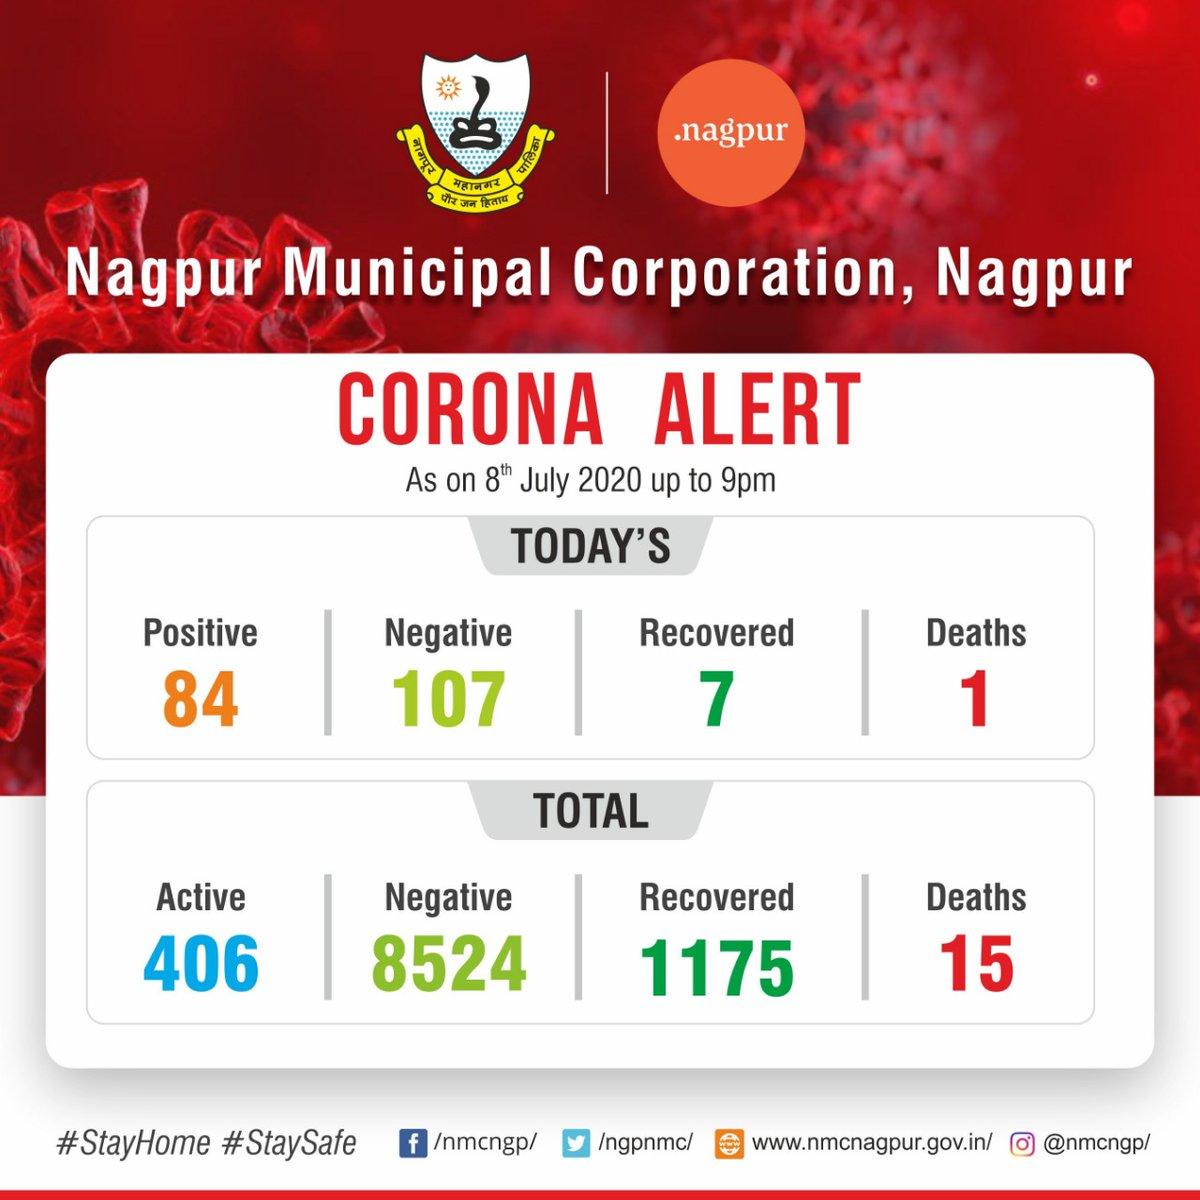 NMC #Covid_19 alert: total status update of the COVID19 cases as on 8 July 2020 #CoronaUpdatesInIndia #WarAgainstVirus #IndiaFightsCoronavirus https://t.co/TJXGr7vAal